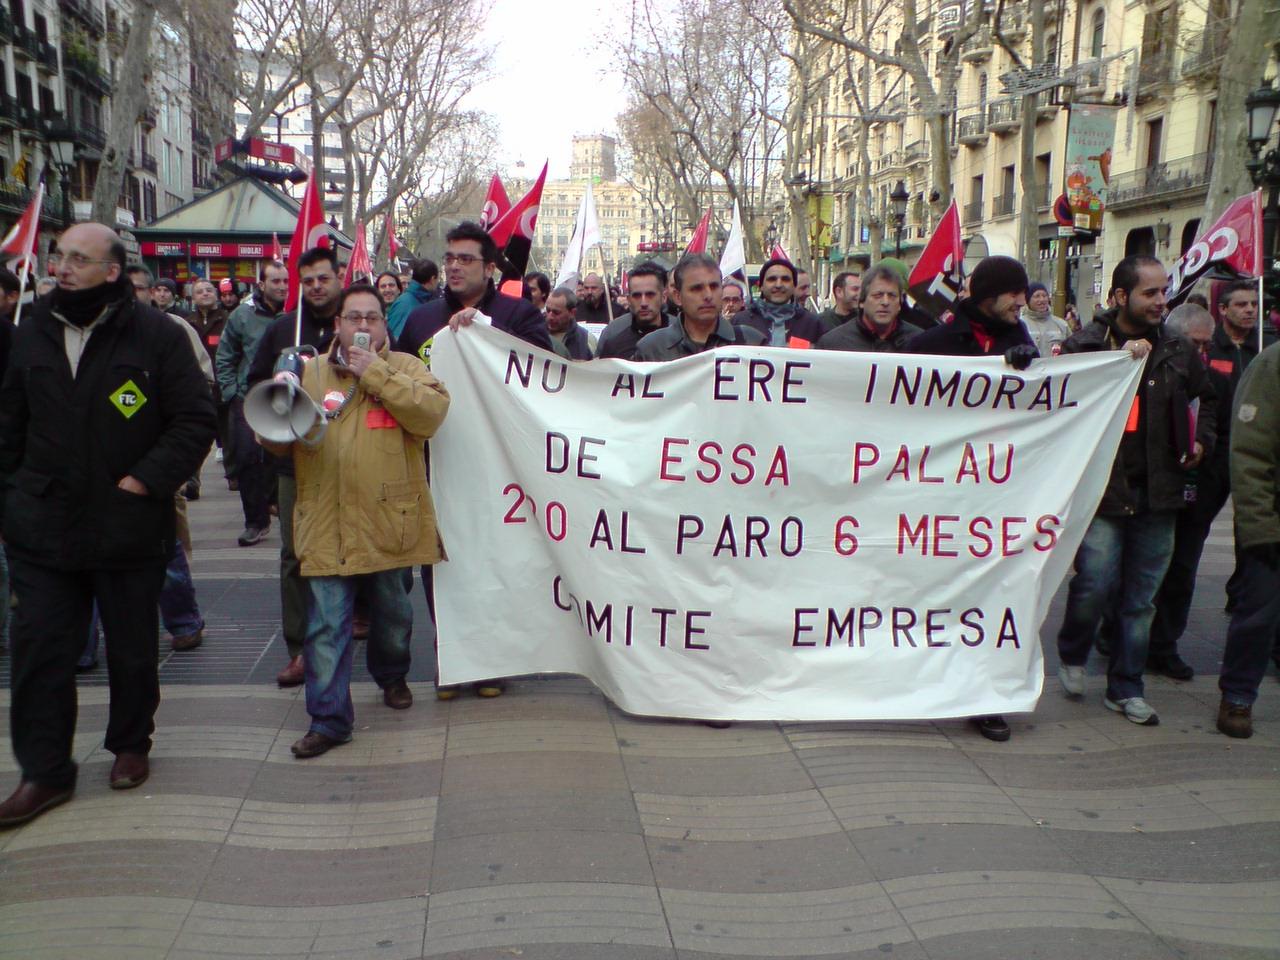 ESSA1.jpg